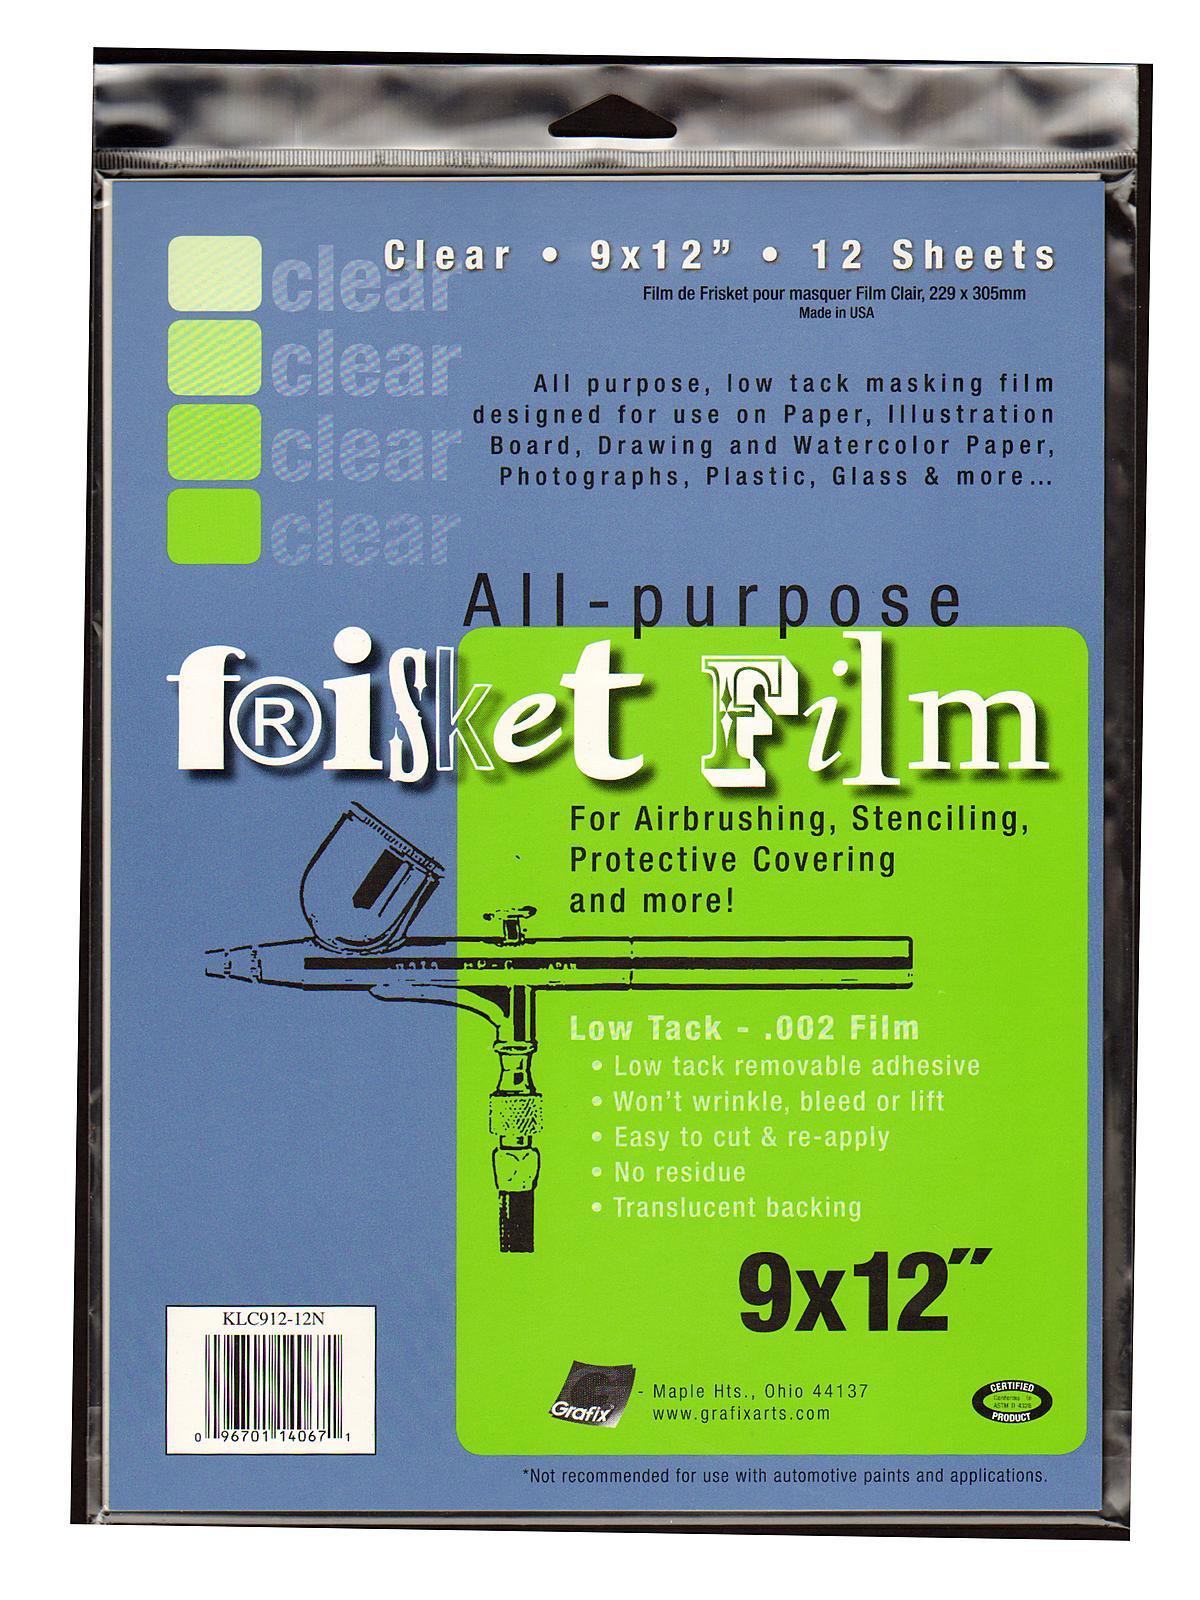 Original Low Tack Frisket Film